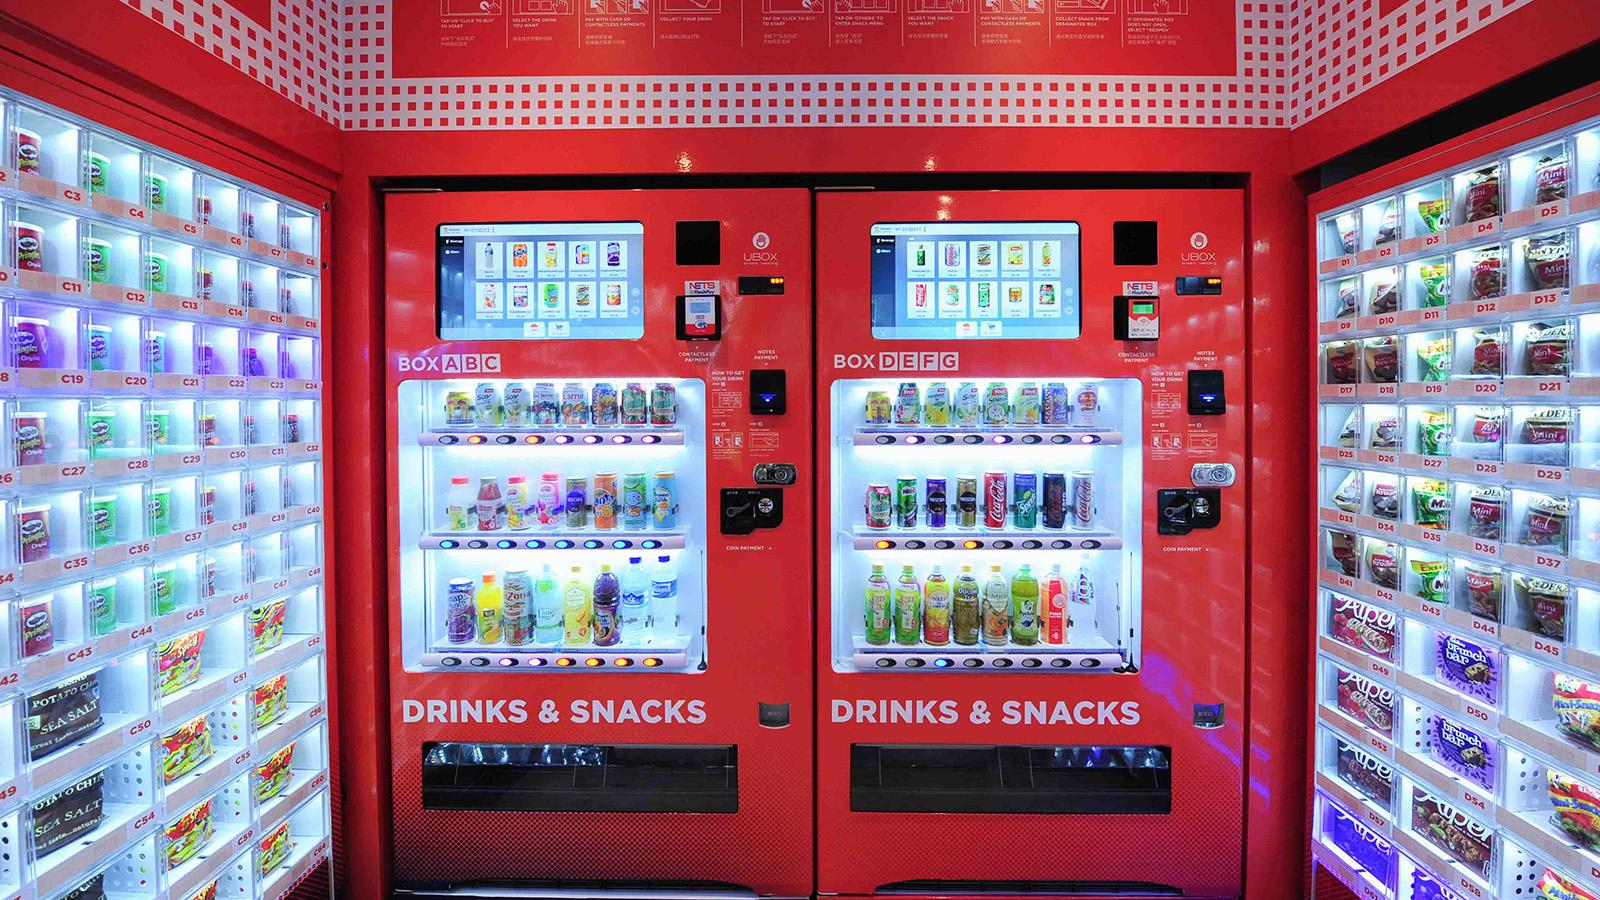 Singapore vending machines dispense amazing array of things